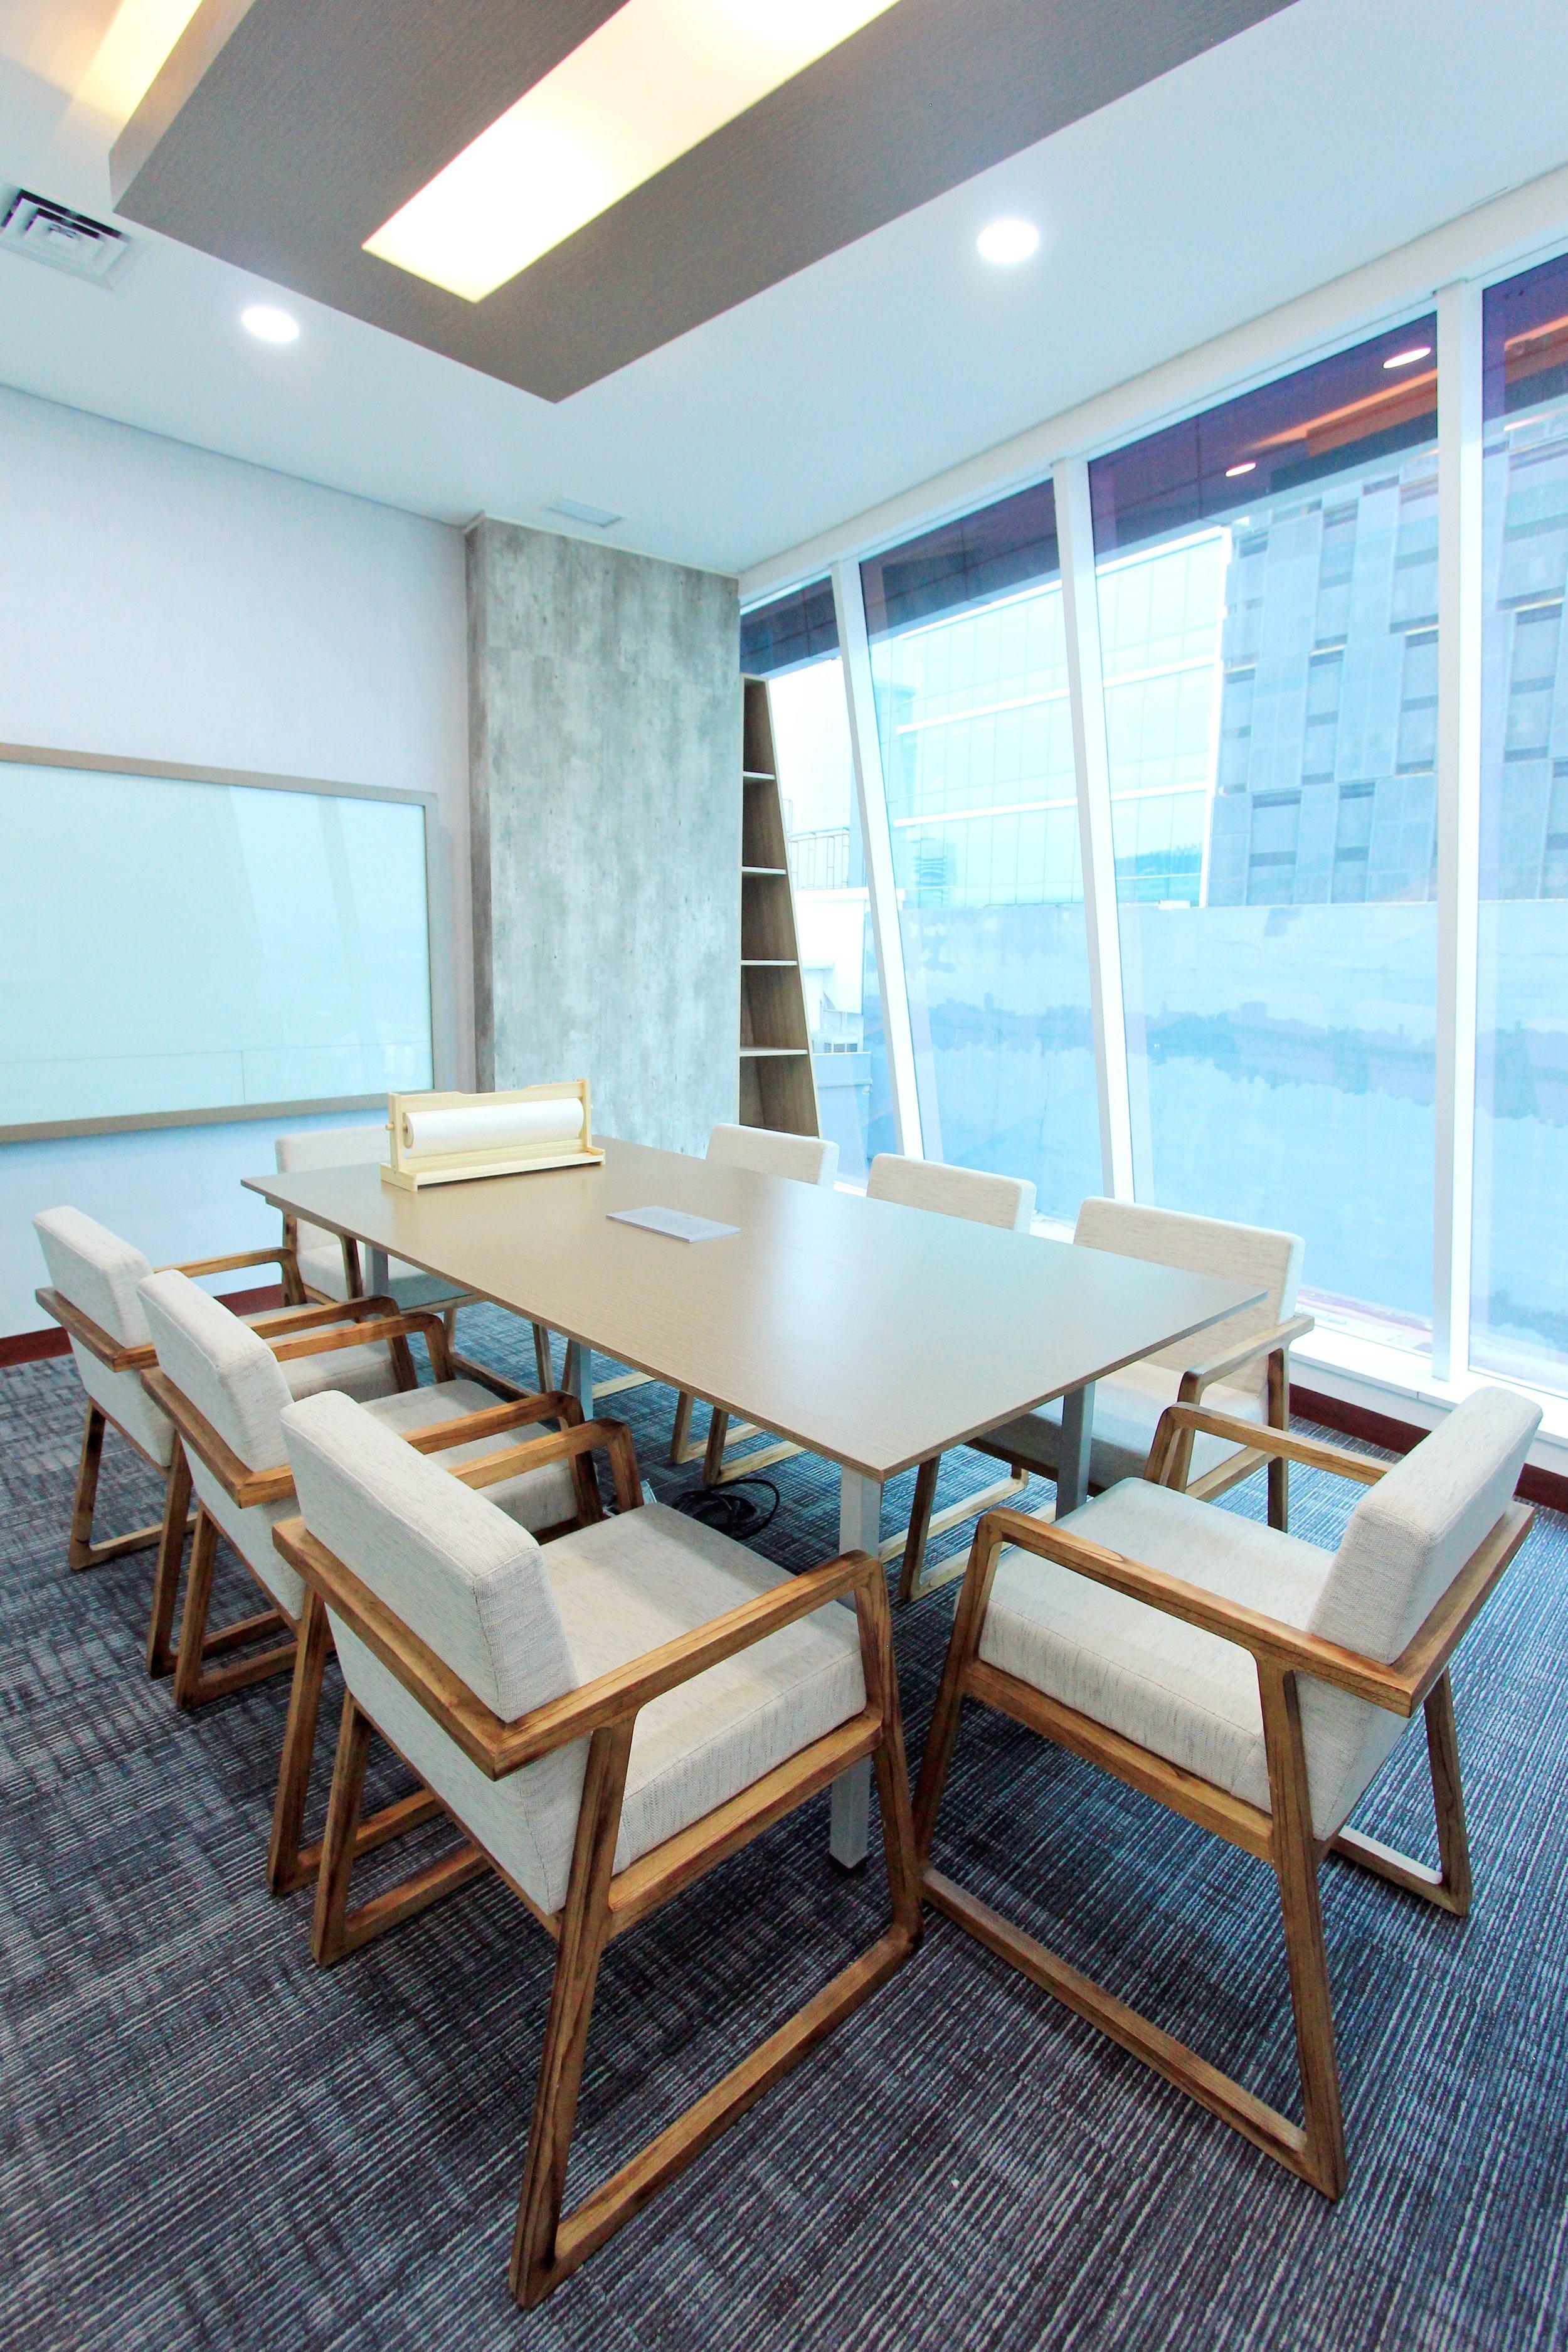 ruang rapat meeting room wahid hasyim menteng jakarta pusat